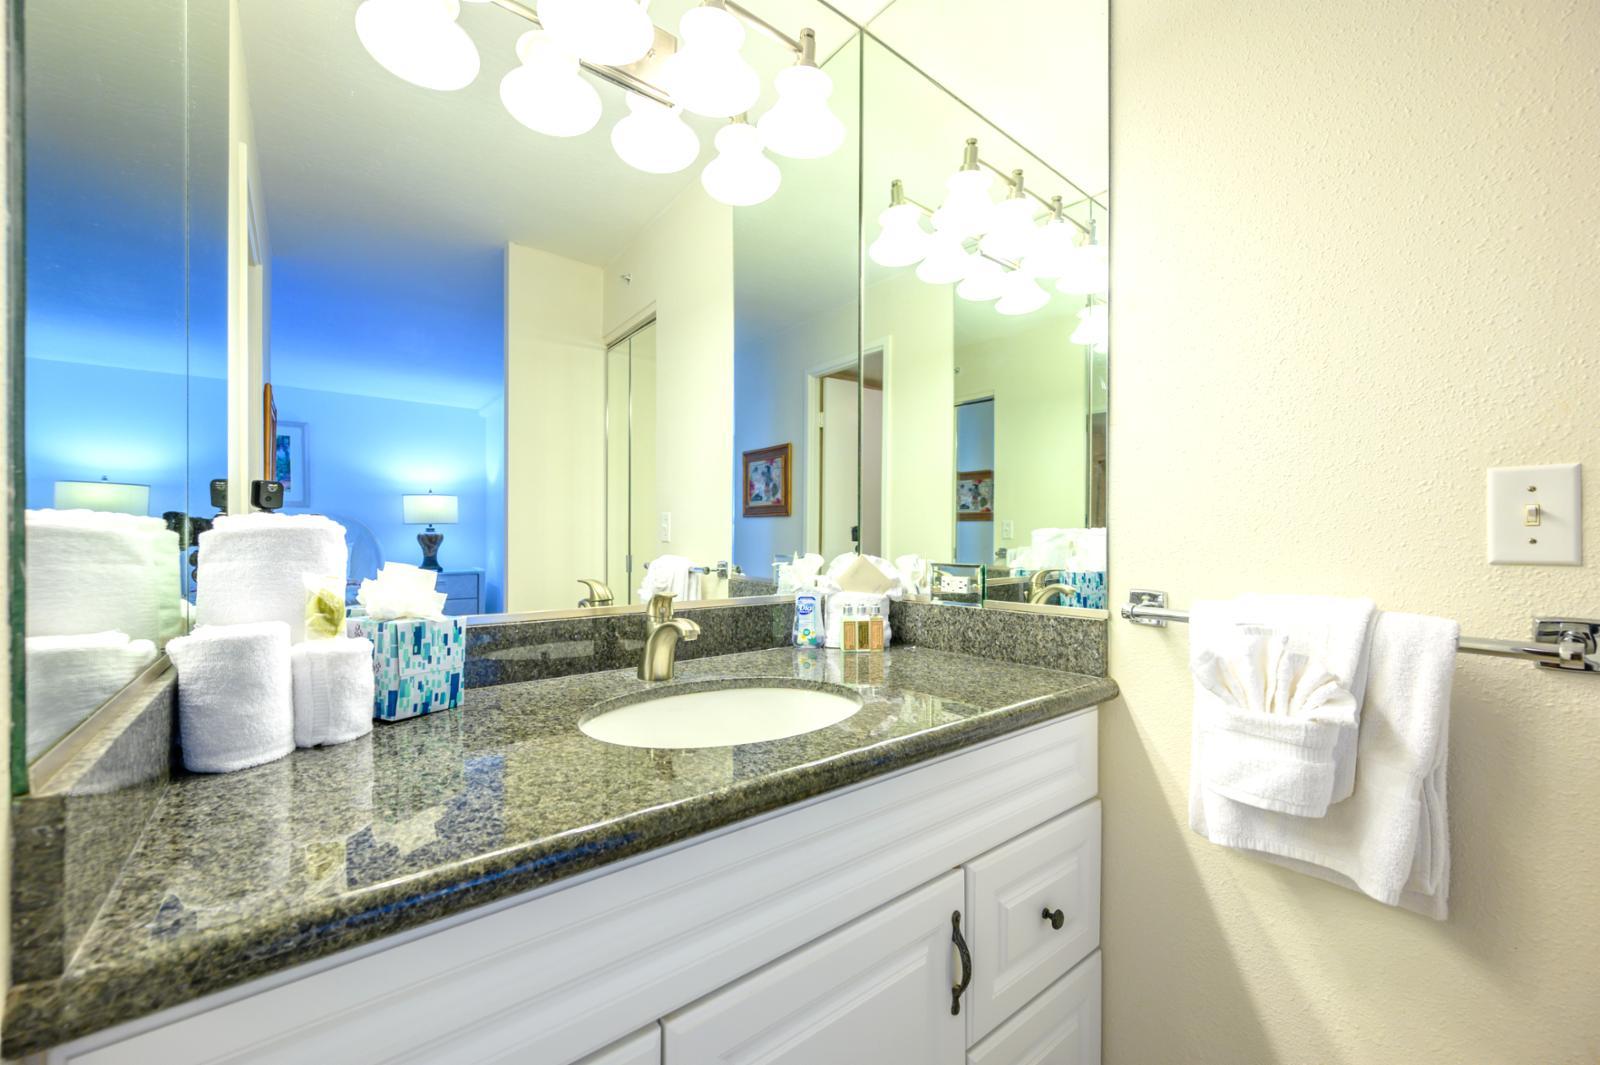 Perfect size guest bathroom with hallway access, en suite